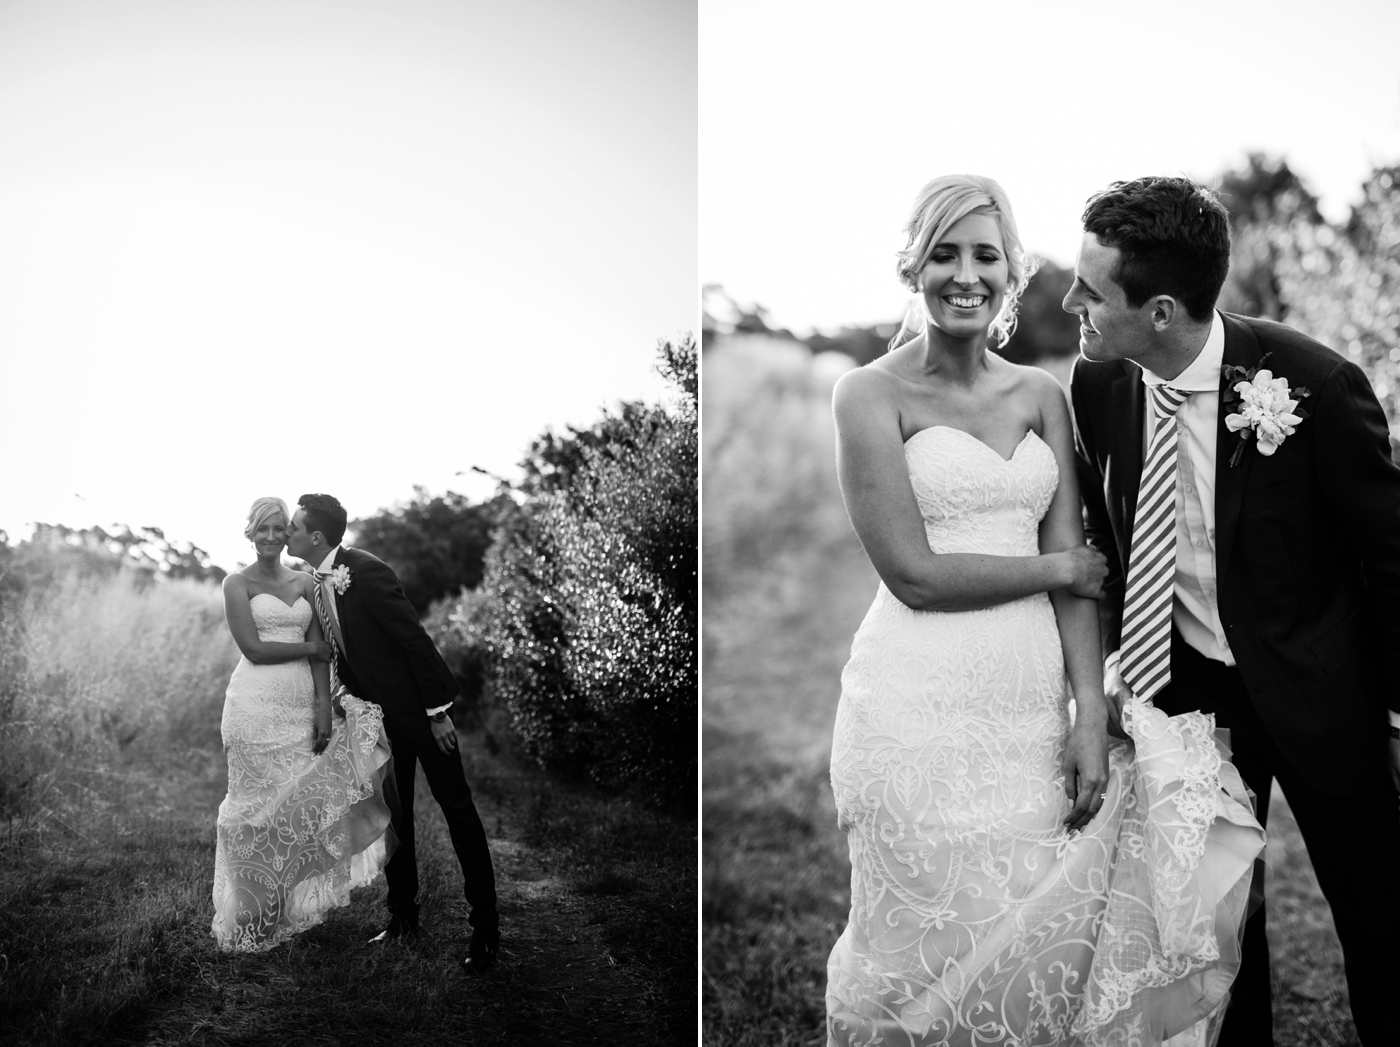 Lauren & Max - Marybank Estate Wedding - Natural wedding photographer in Adelaide - www.katherineschultzphotography.com 108